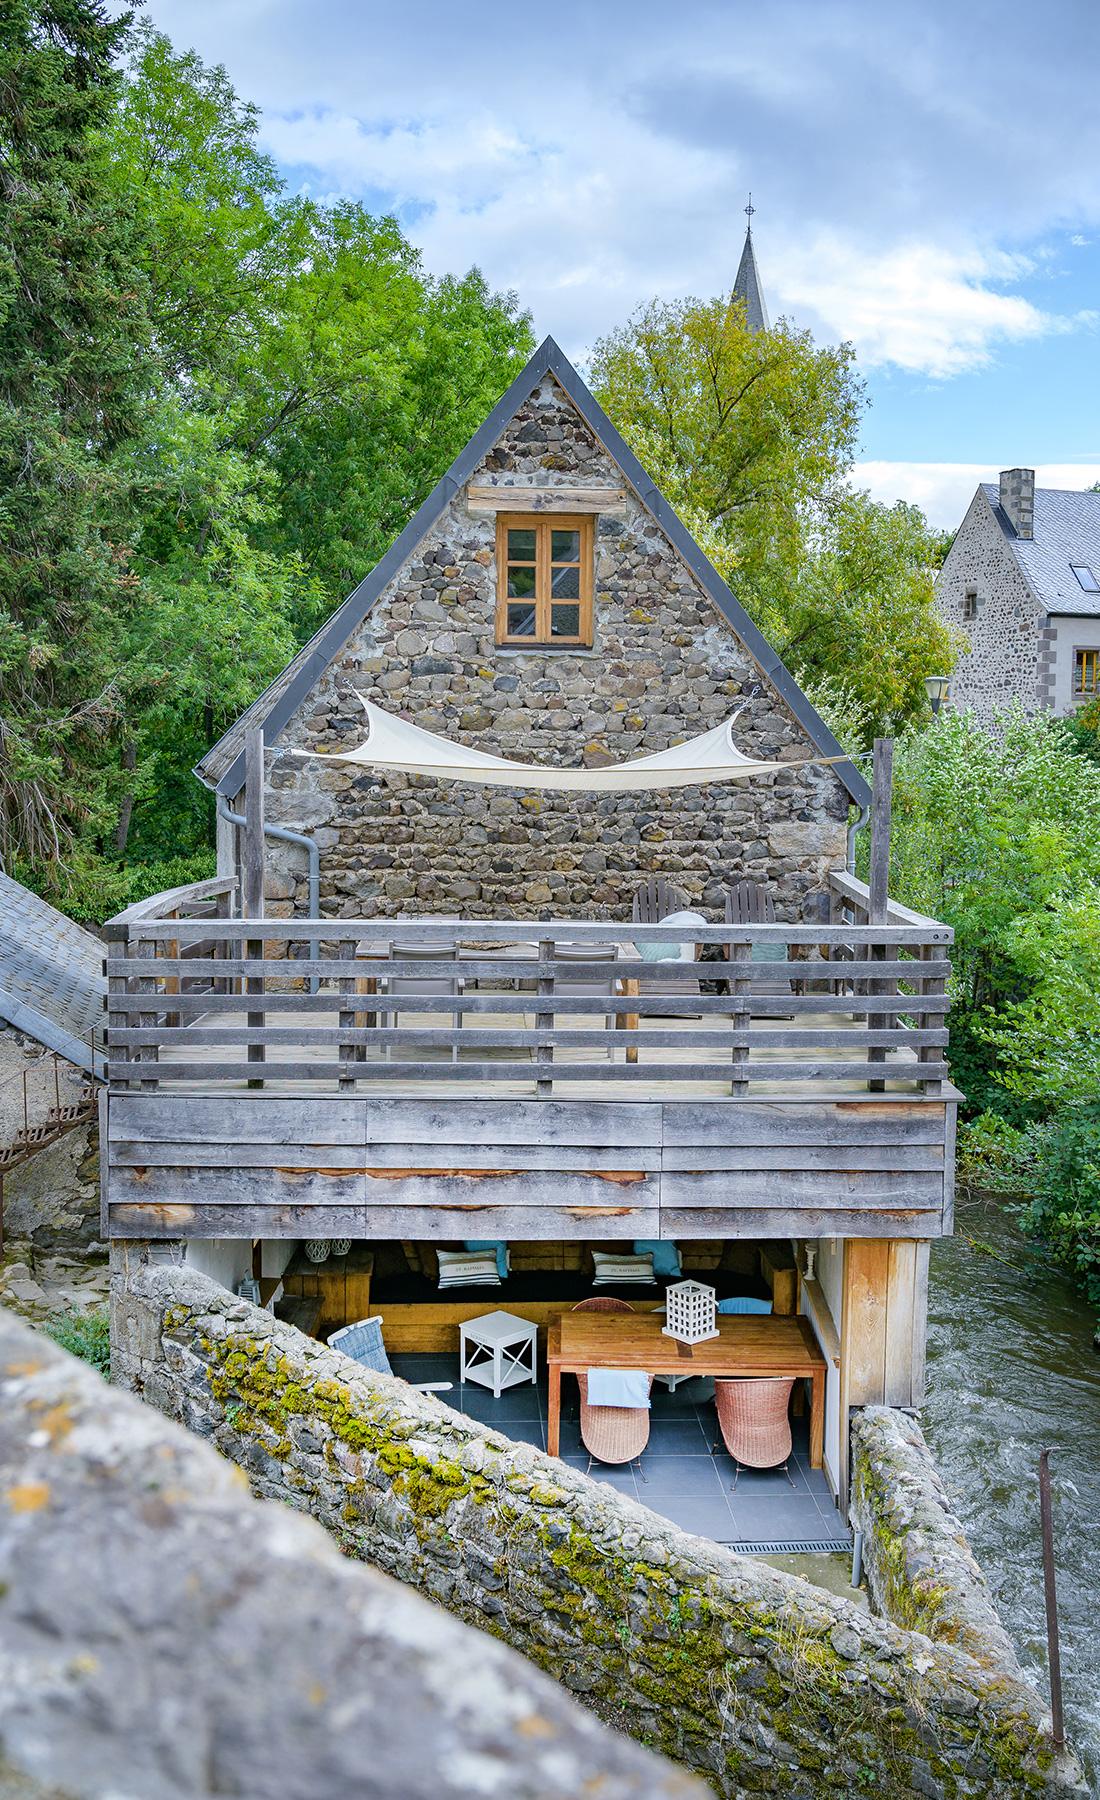 Vakantiehuis Murol in Auvergne-Rhône-Alpes, Frankrijk